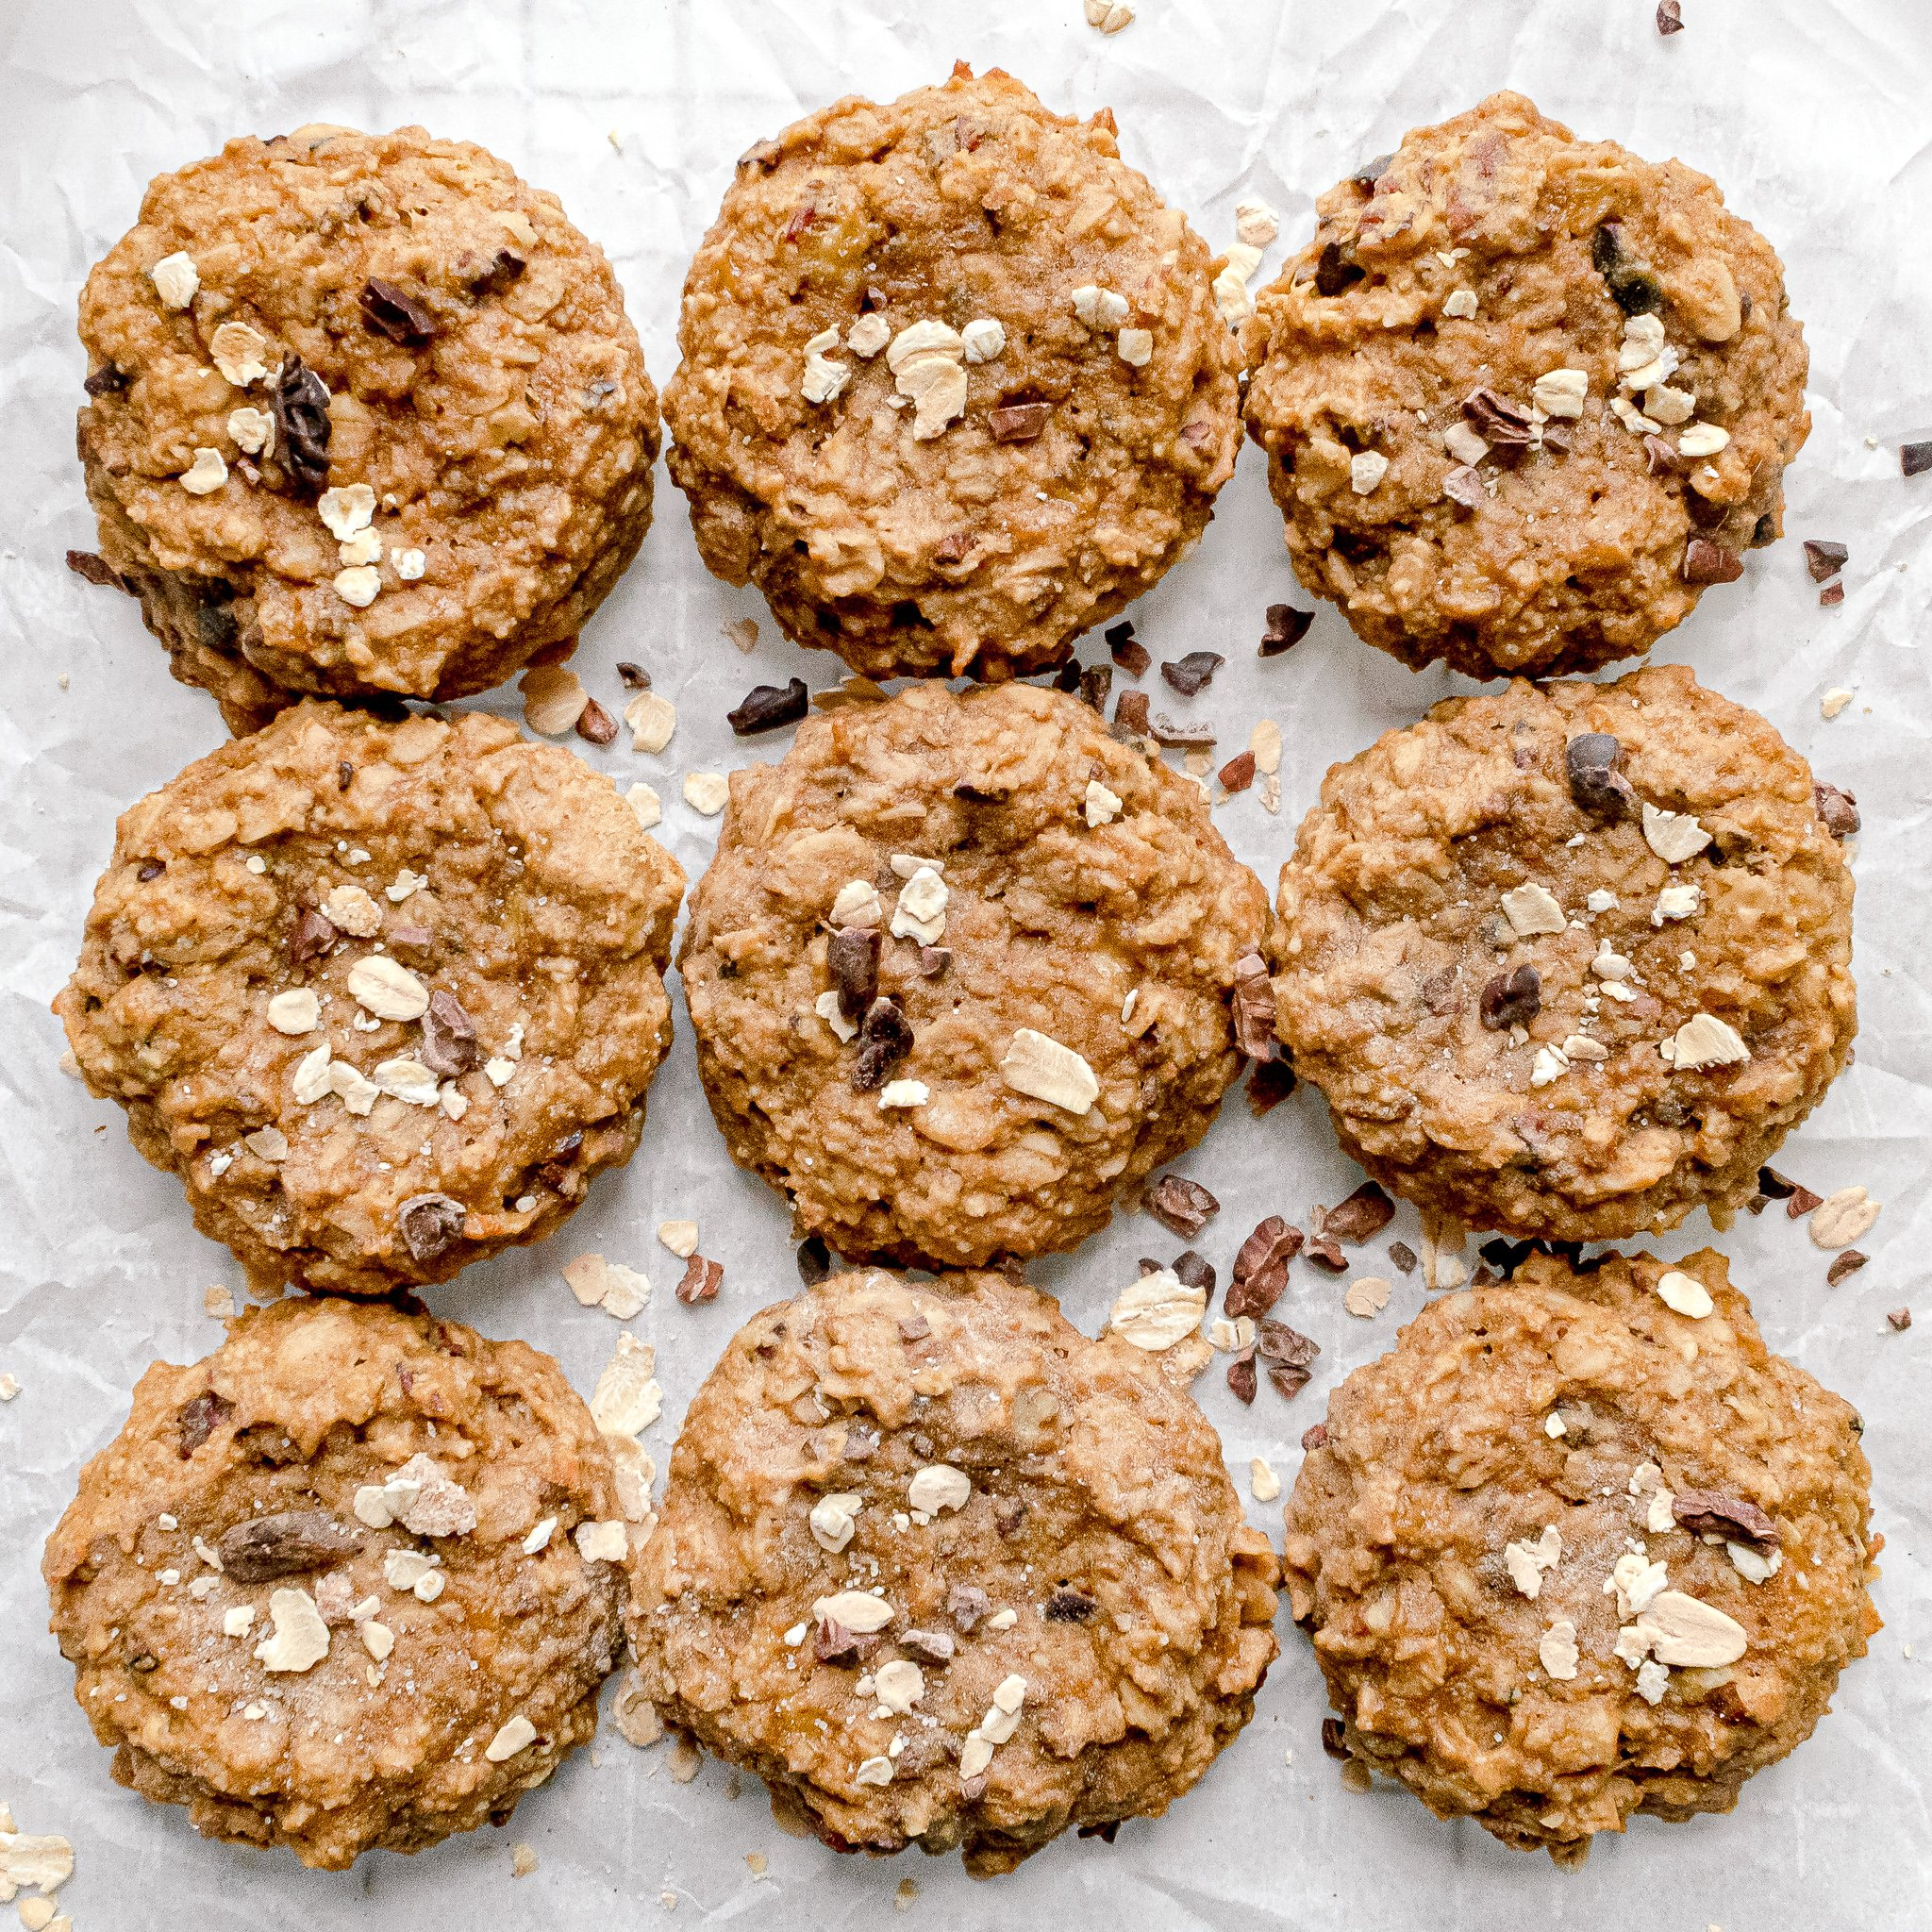 Banana Oatmeal Cookies - Vegan, Gluten Free, No Refined Sugar! | Chenée Today